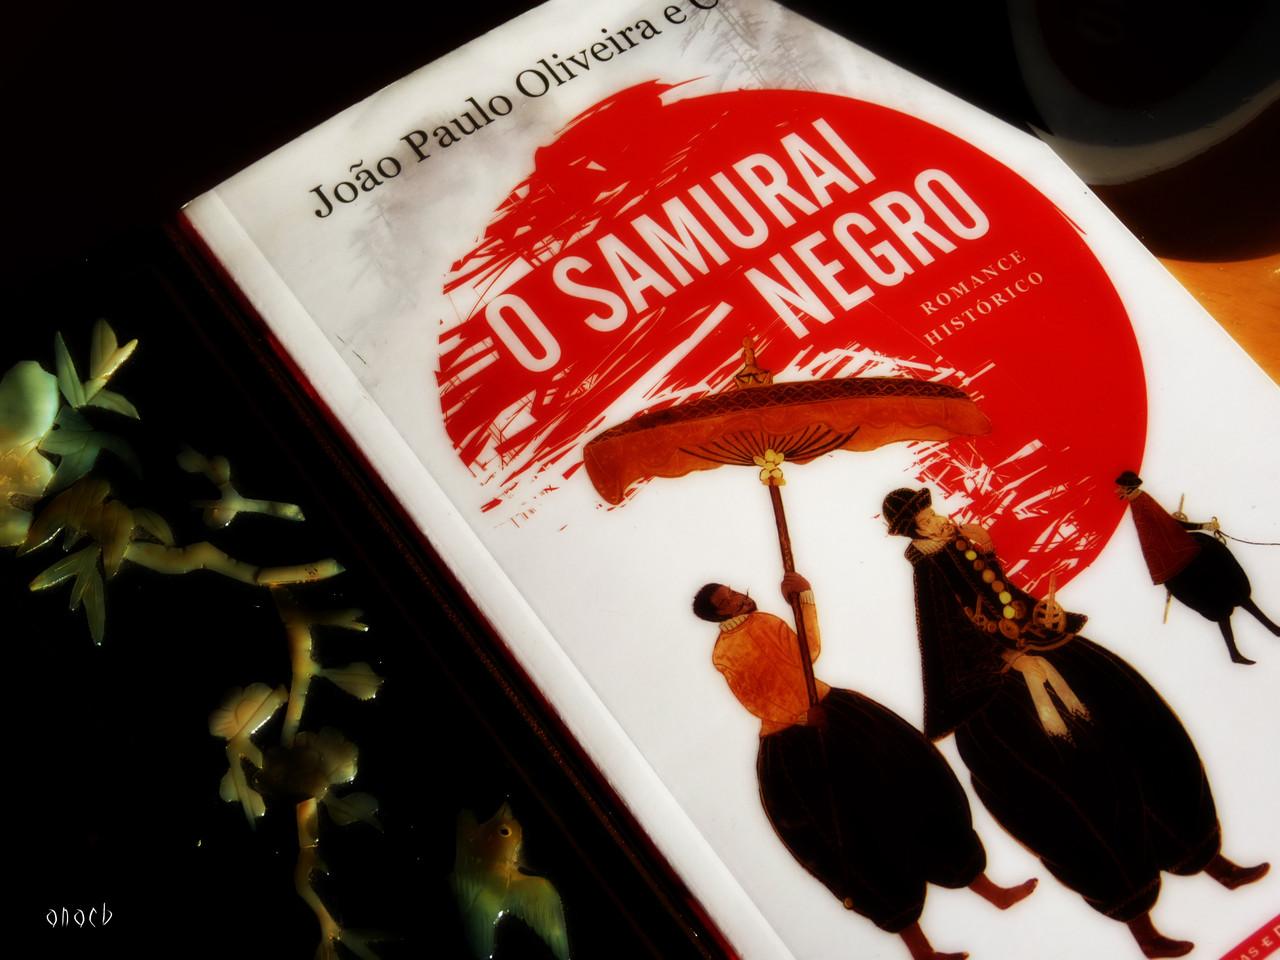 O Samurai Negro.jpg